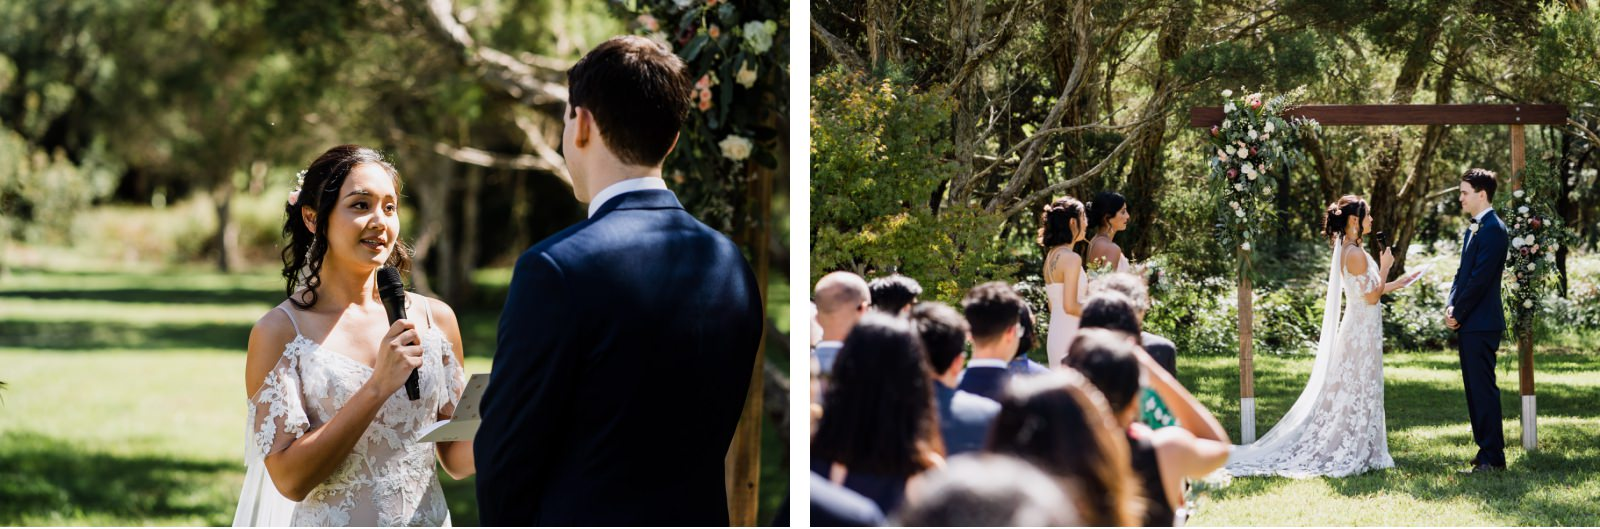 wollombi-wedding-photography-hunter-valley-wedding-photographers-32